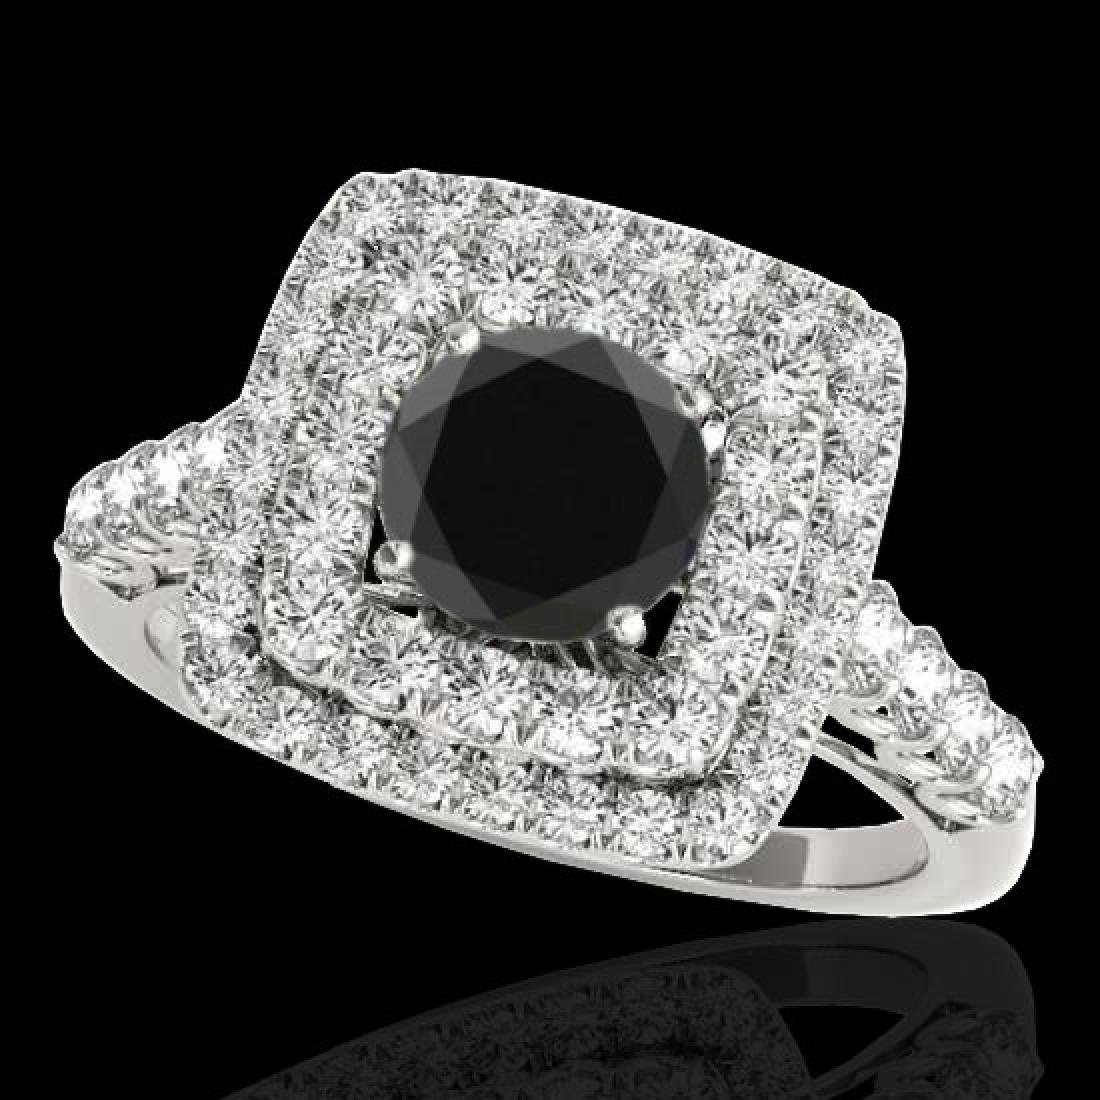 2.3 CTW Certified VS Black Diamond Solitaire Halo Ring